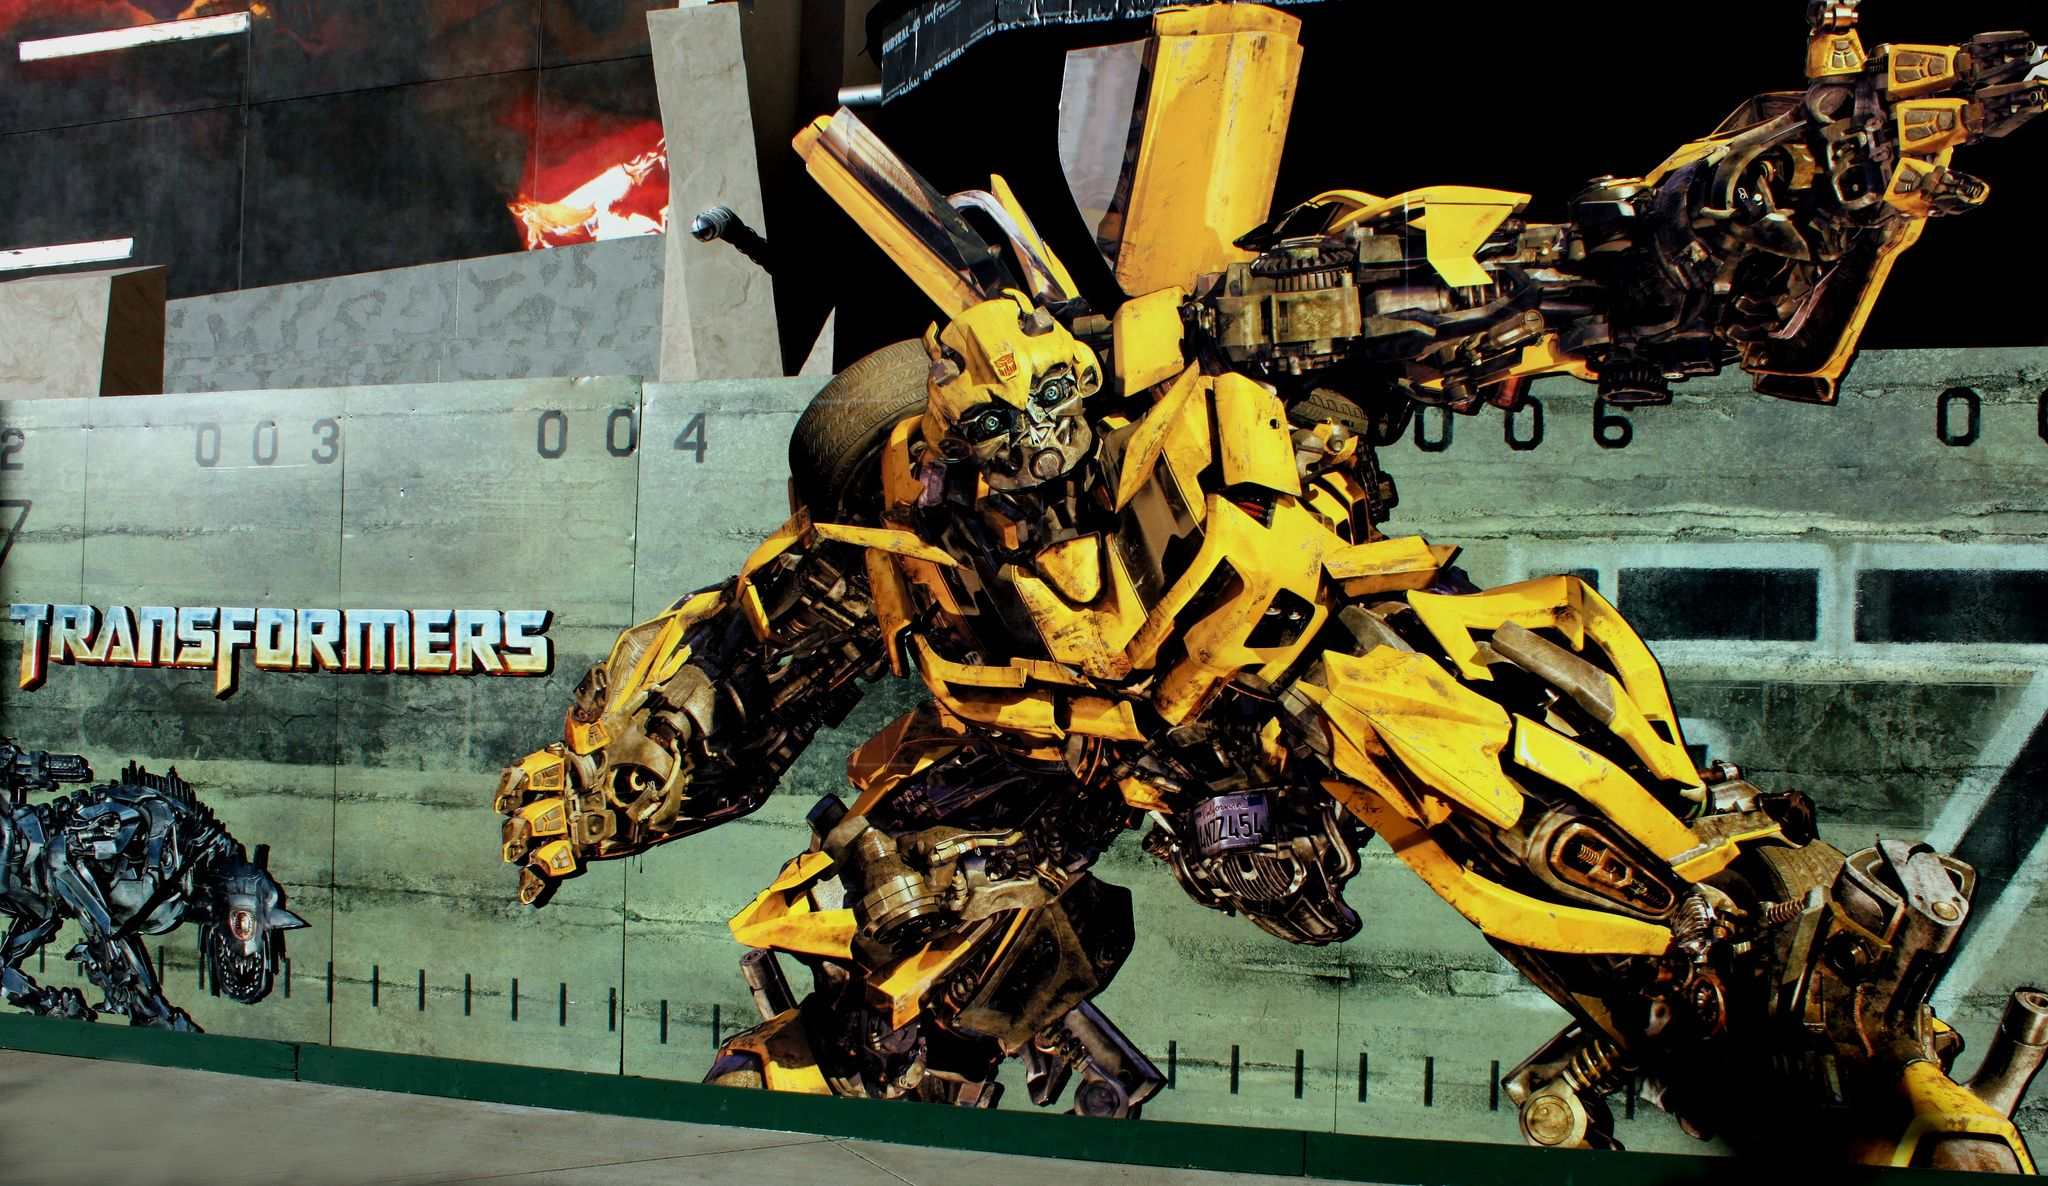 Transformers set at Universal Studios Hollywood